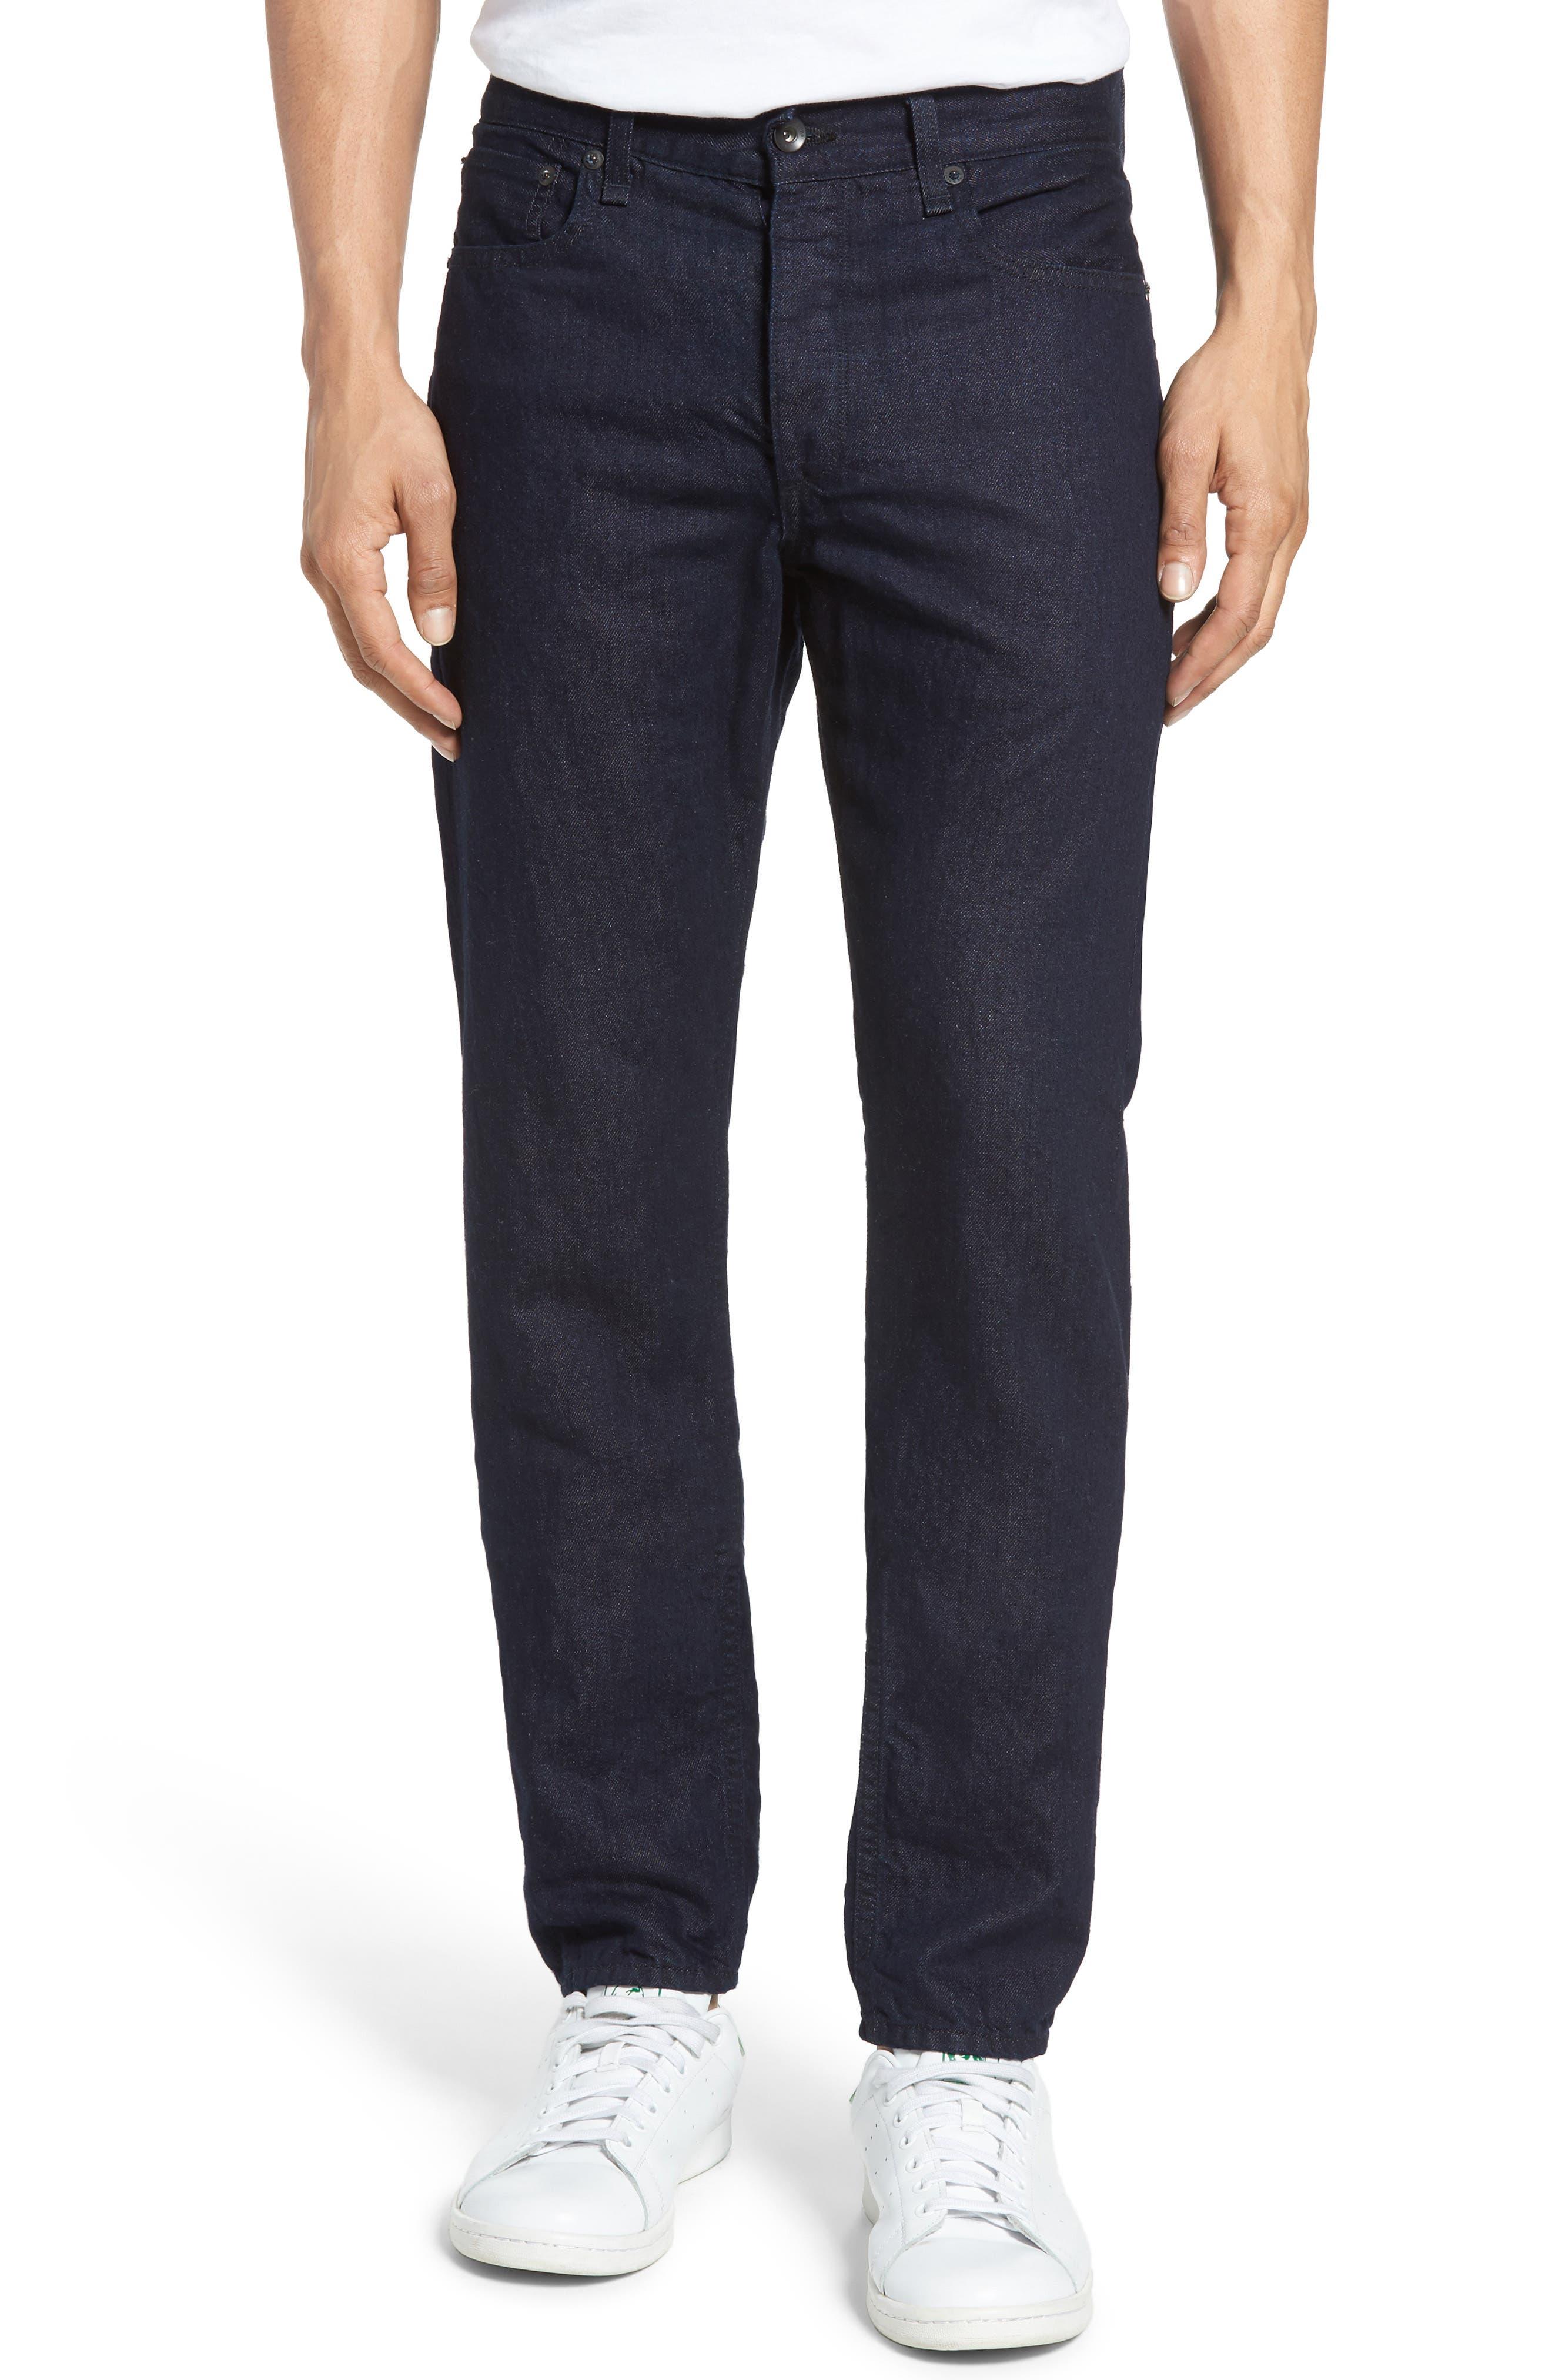 rag & bone Fit 2 Slim Fit Jeans (Indigo Linen)